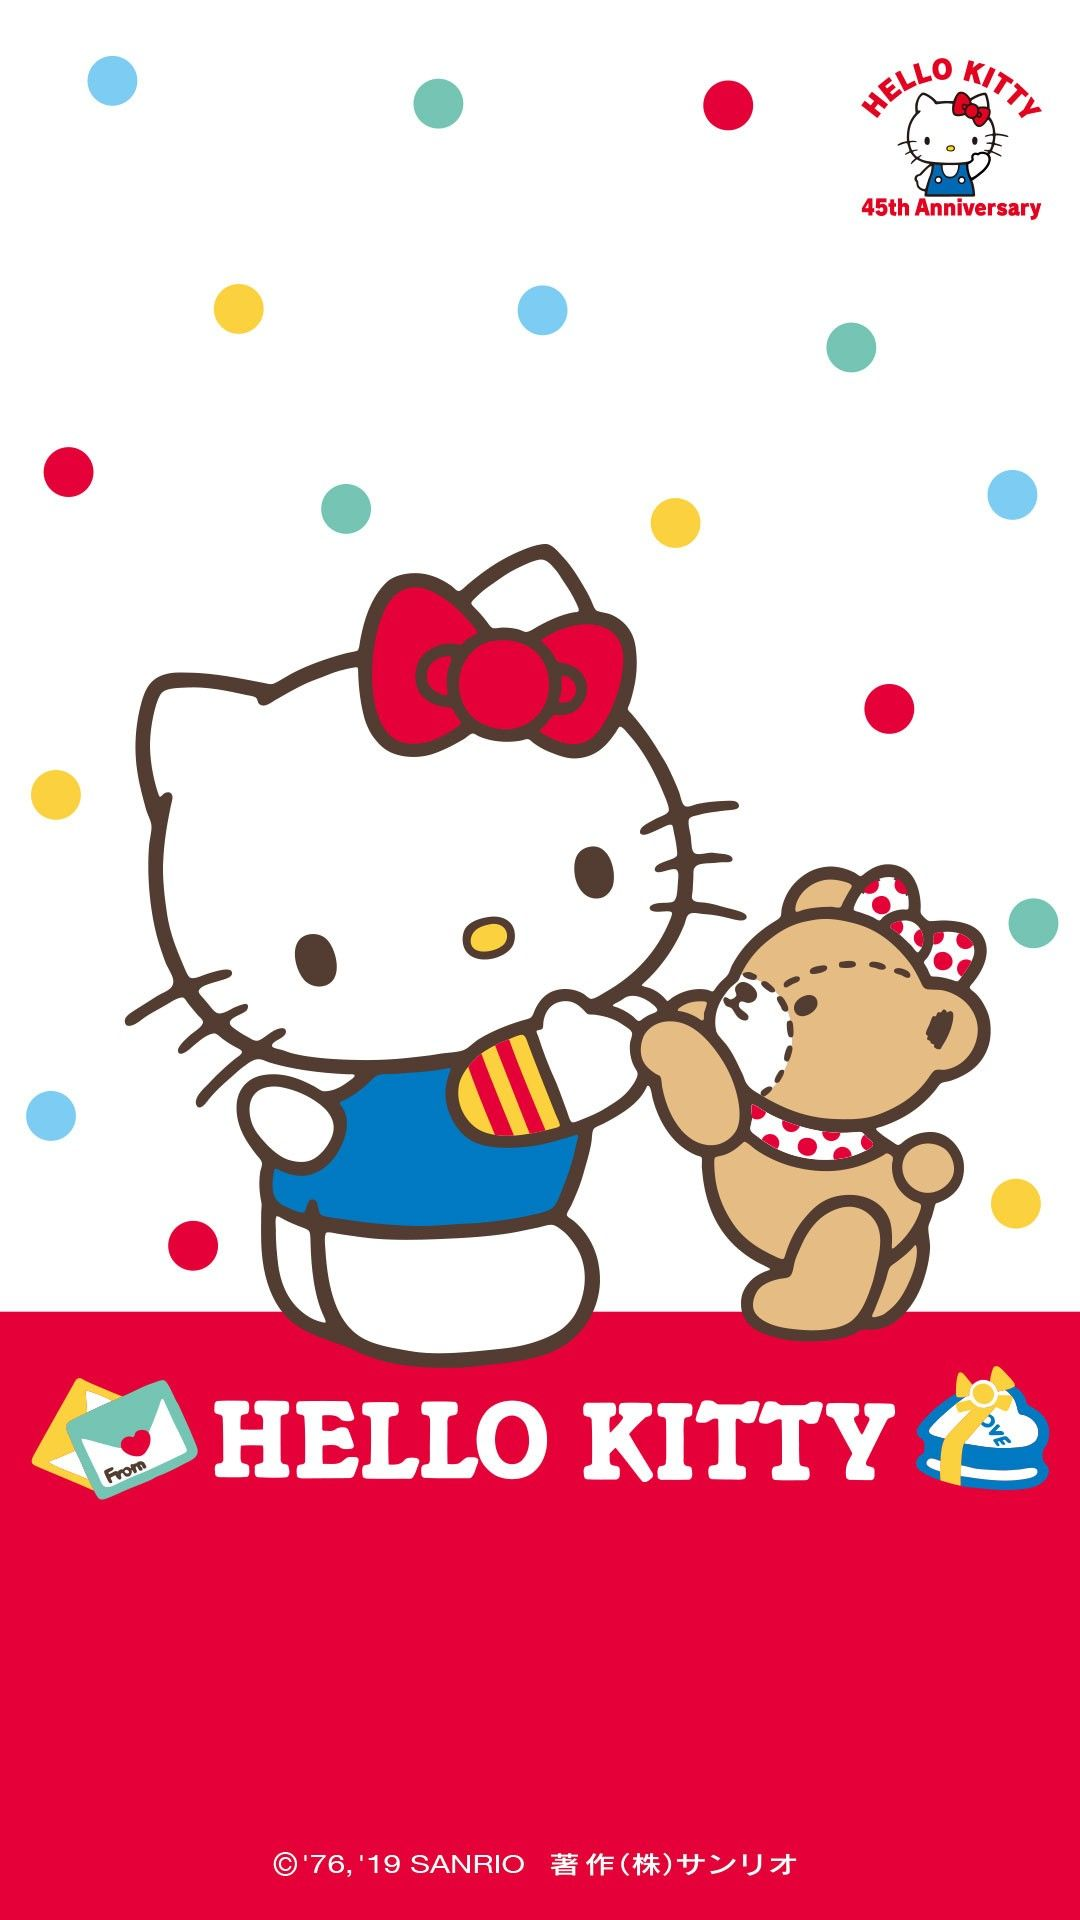 Hello Kitty 45th Anniversary Wallpaper Cute Kitty Hello